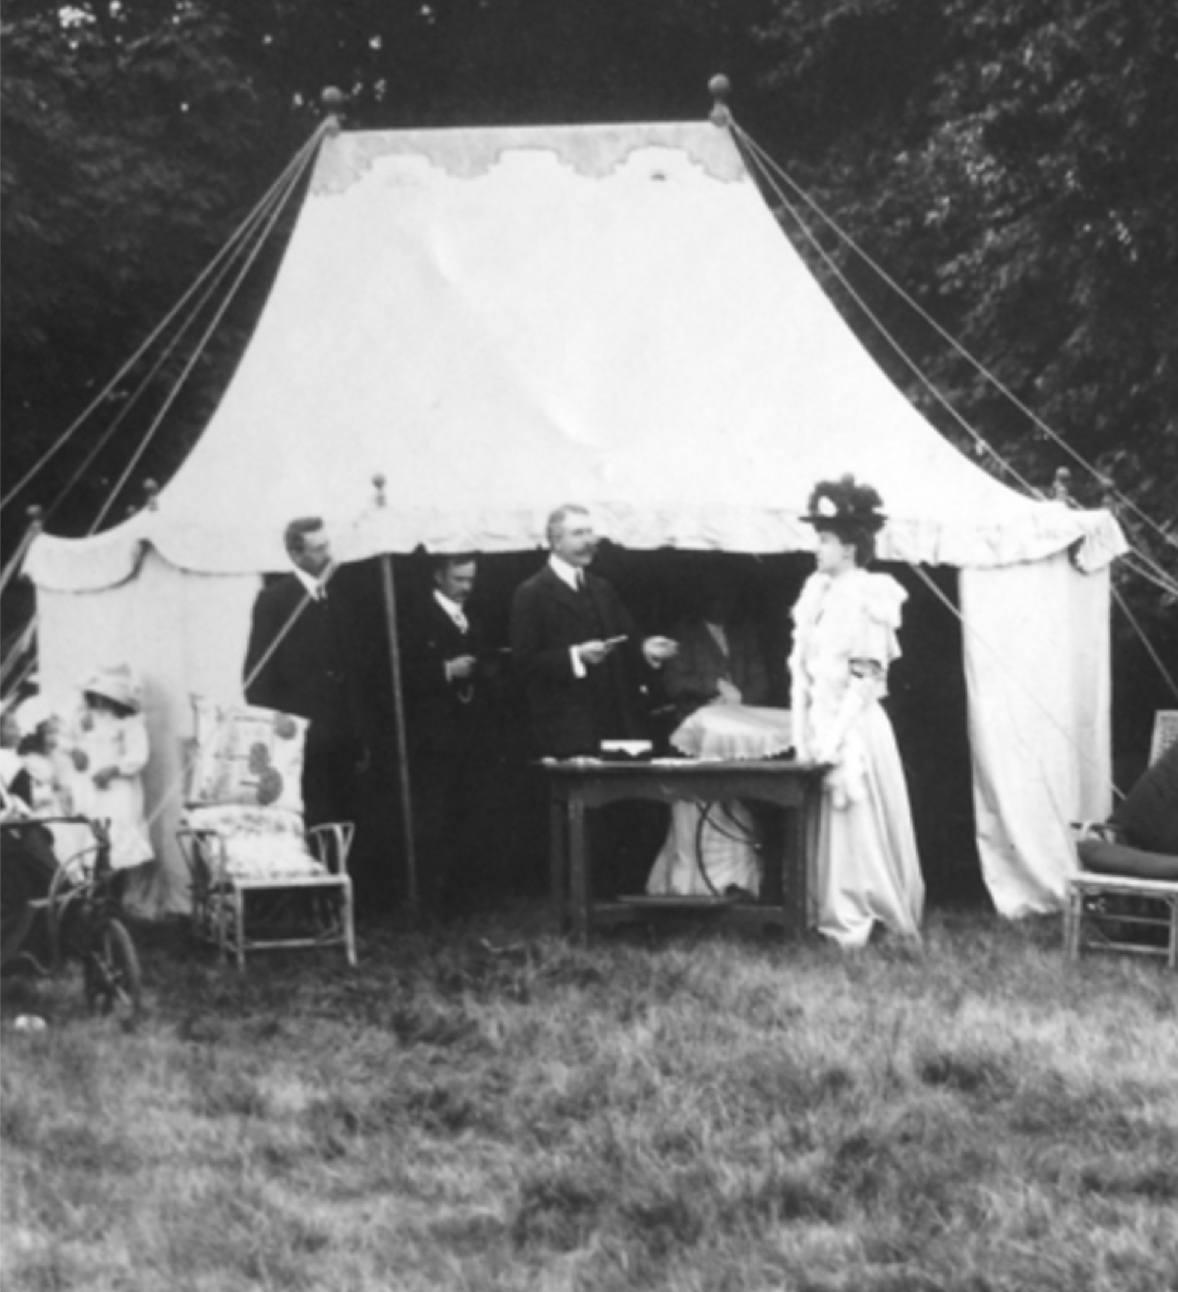 History of luxury wedding venue, Pylewell Park.